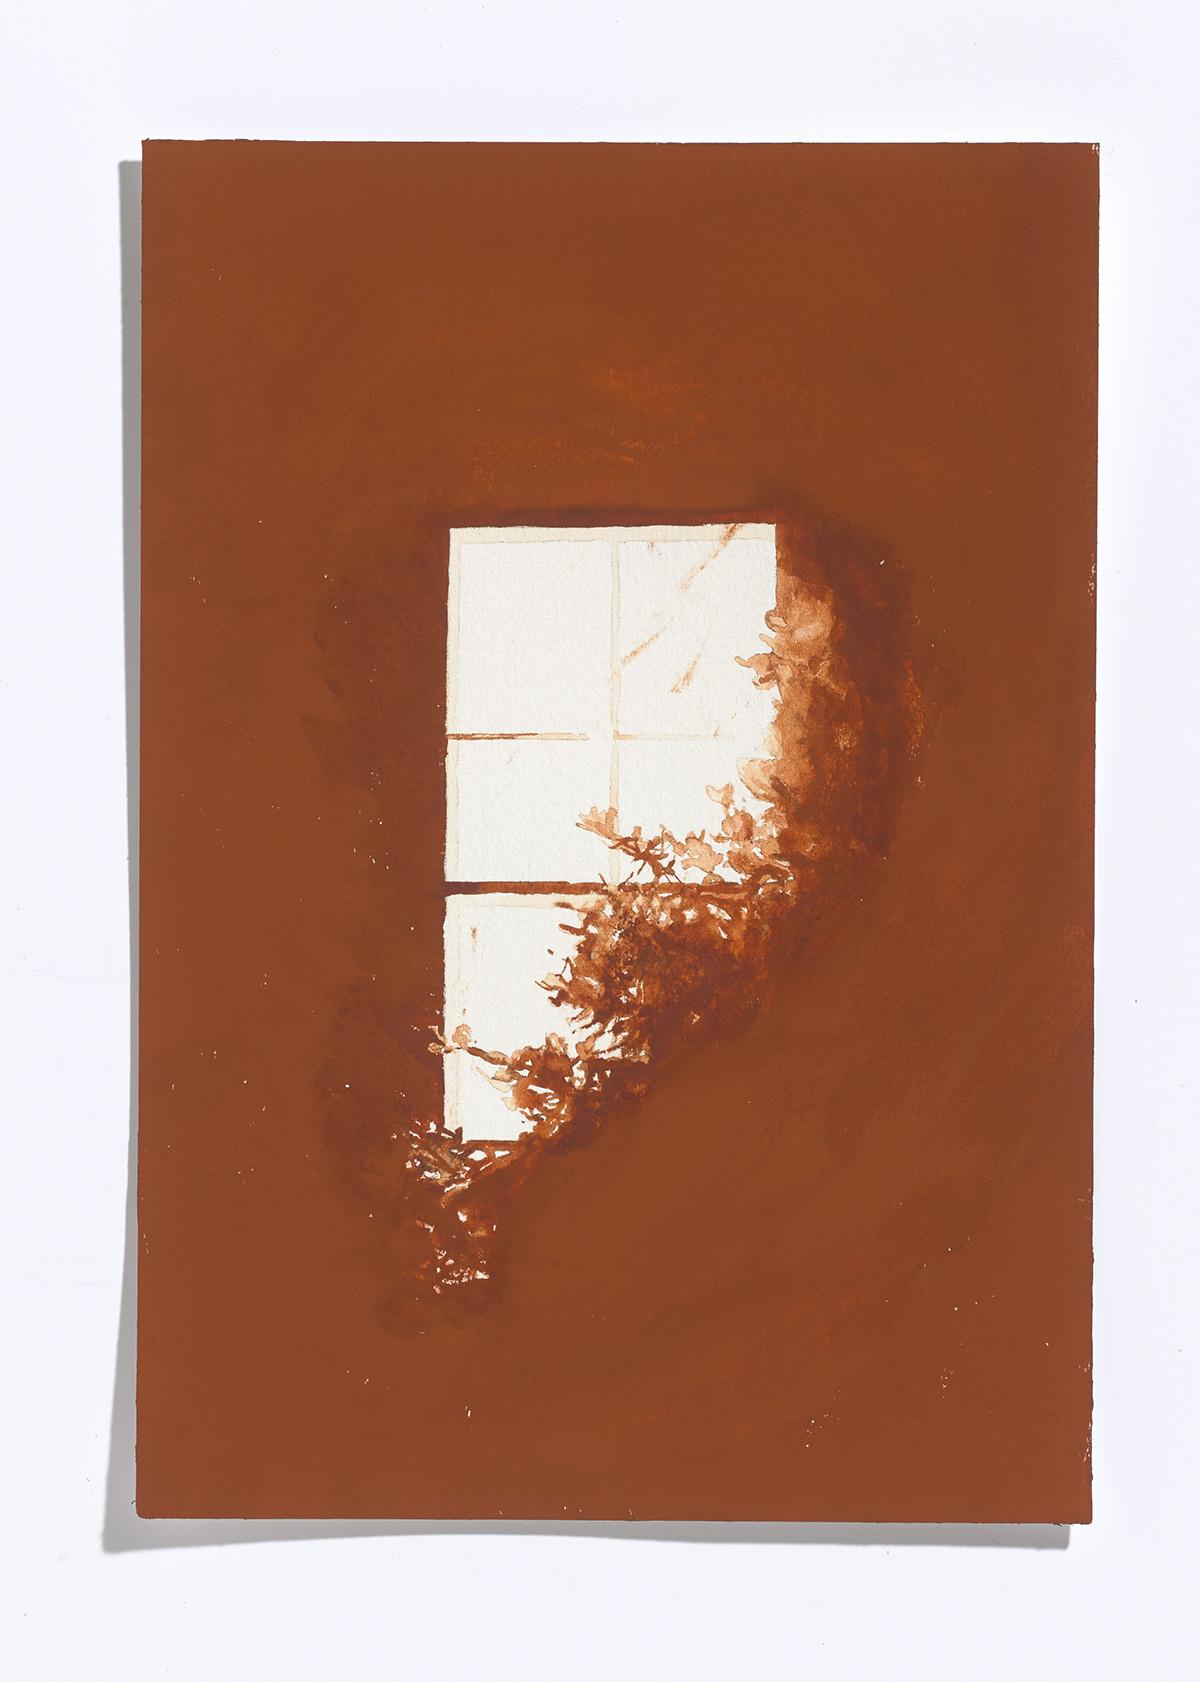 Rust window,2017,gouache on paper,10.25 x 7 1/8th in